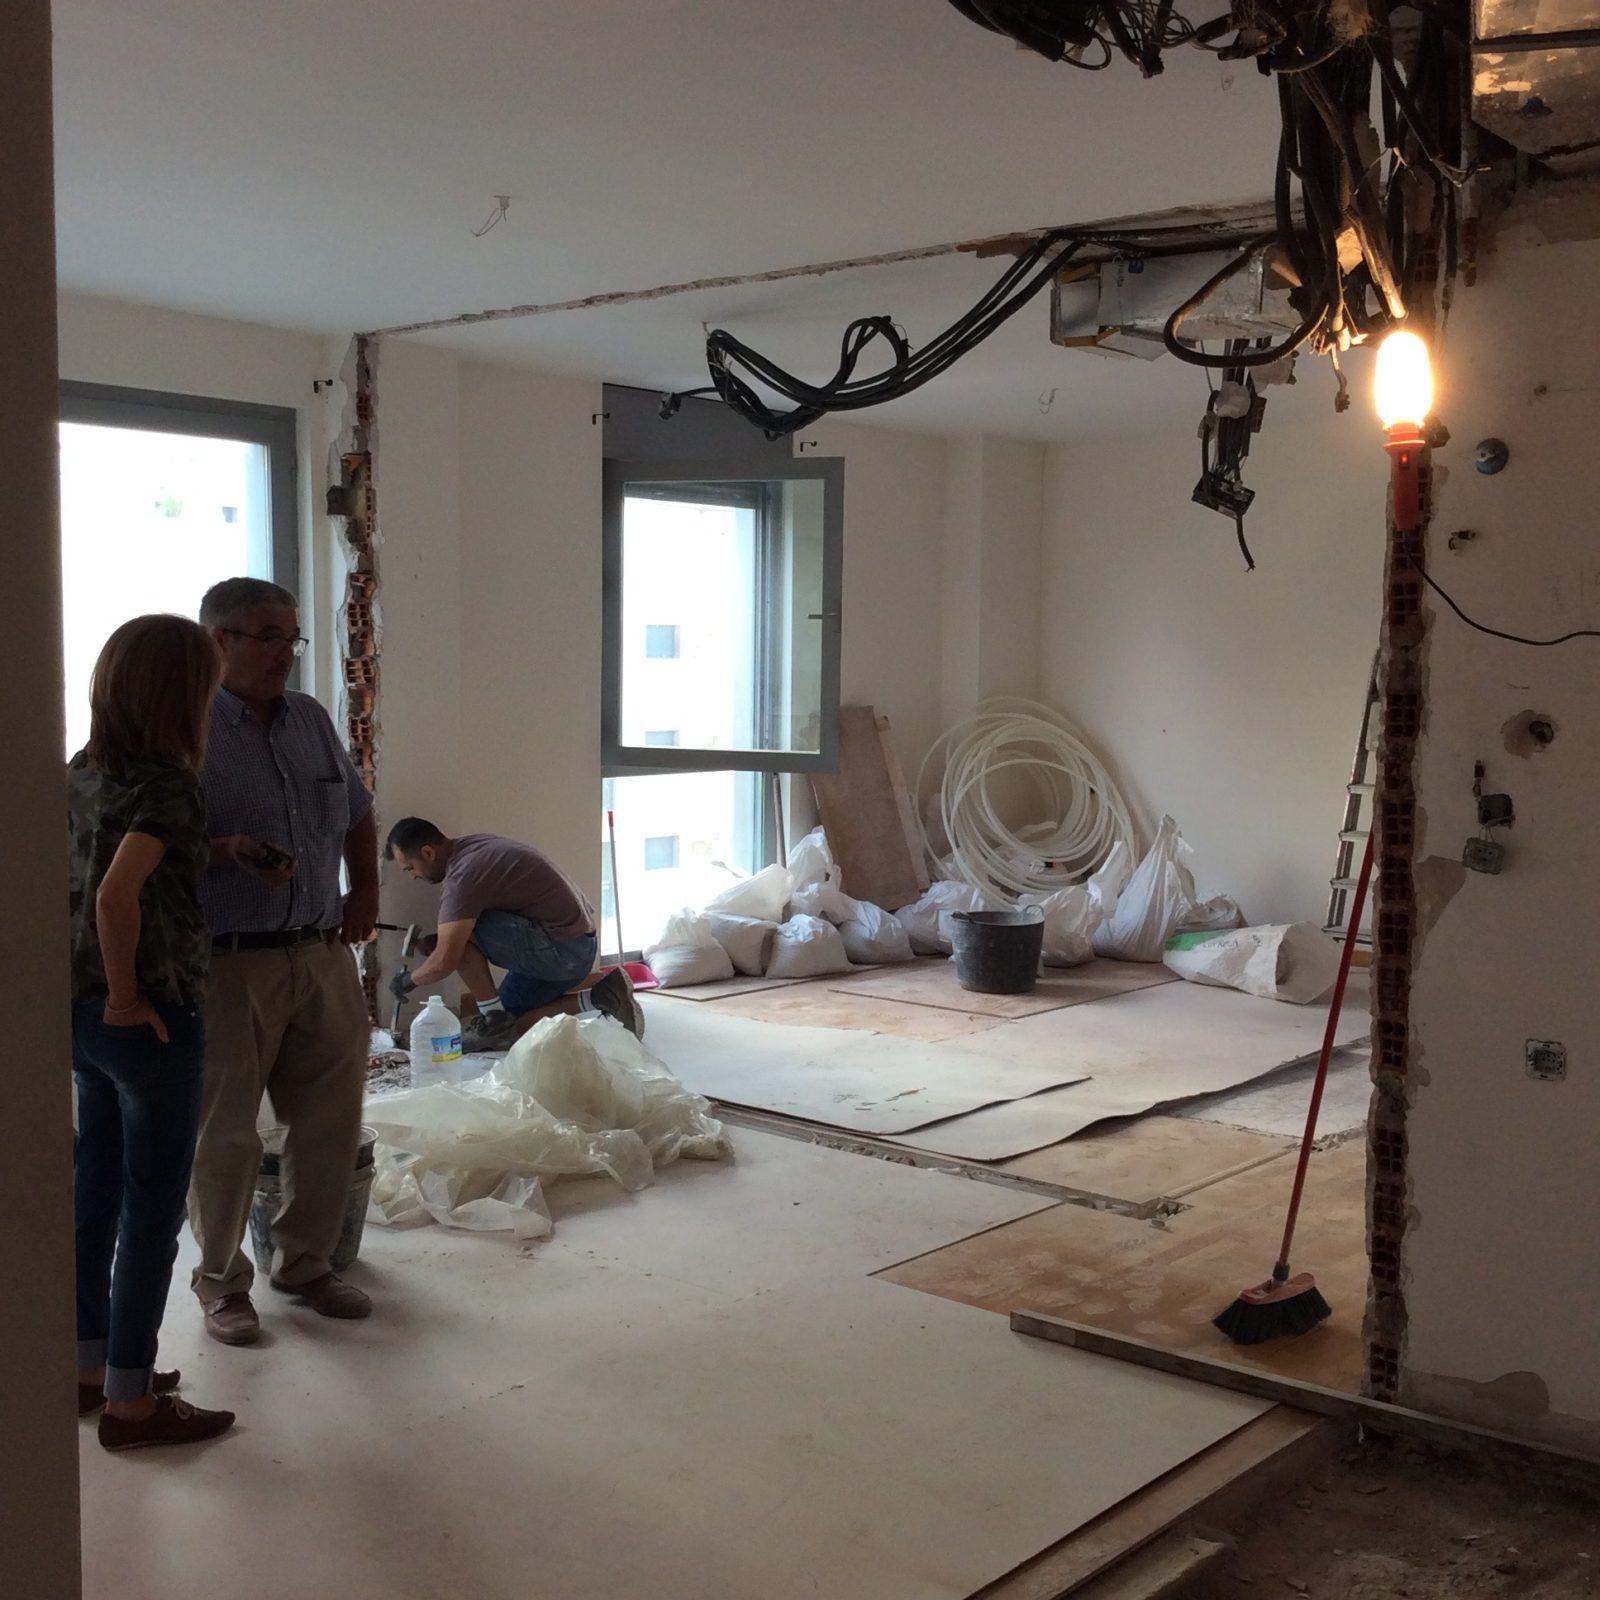 IMG 5962 - Apartamento | Mairena del Aljarafe | Sevilla